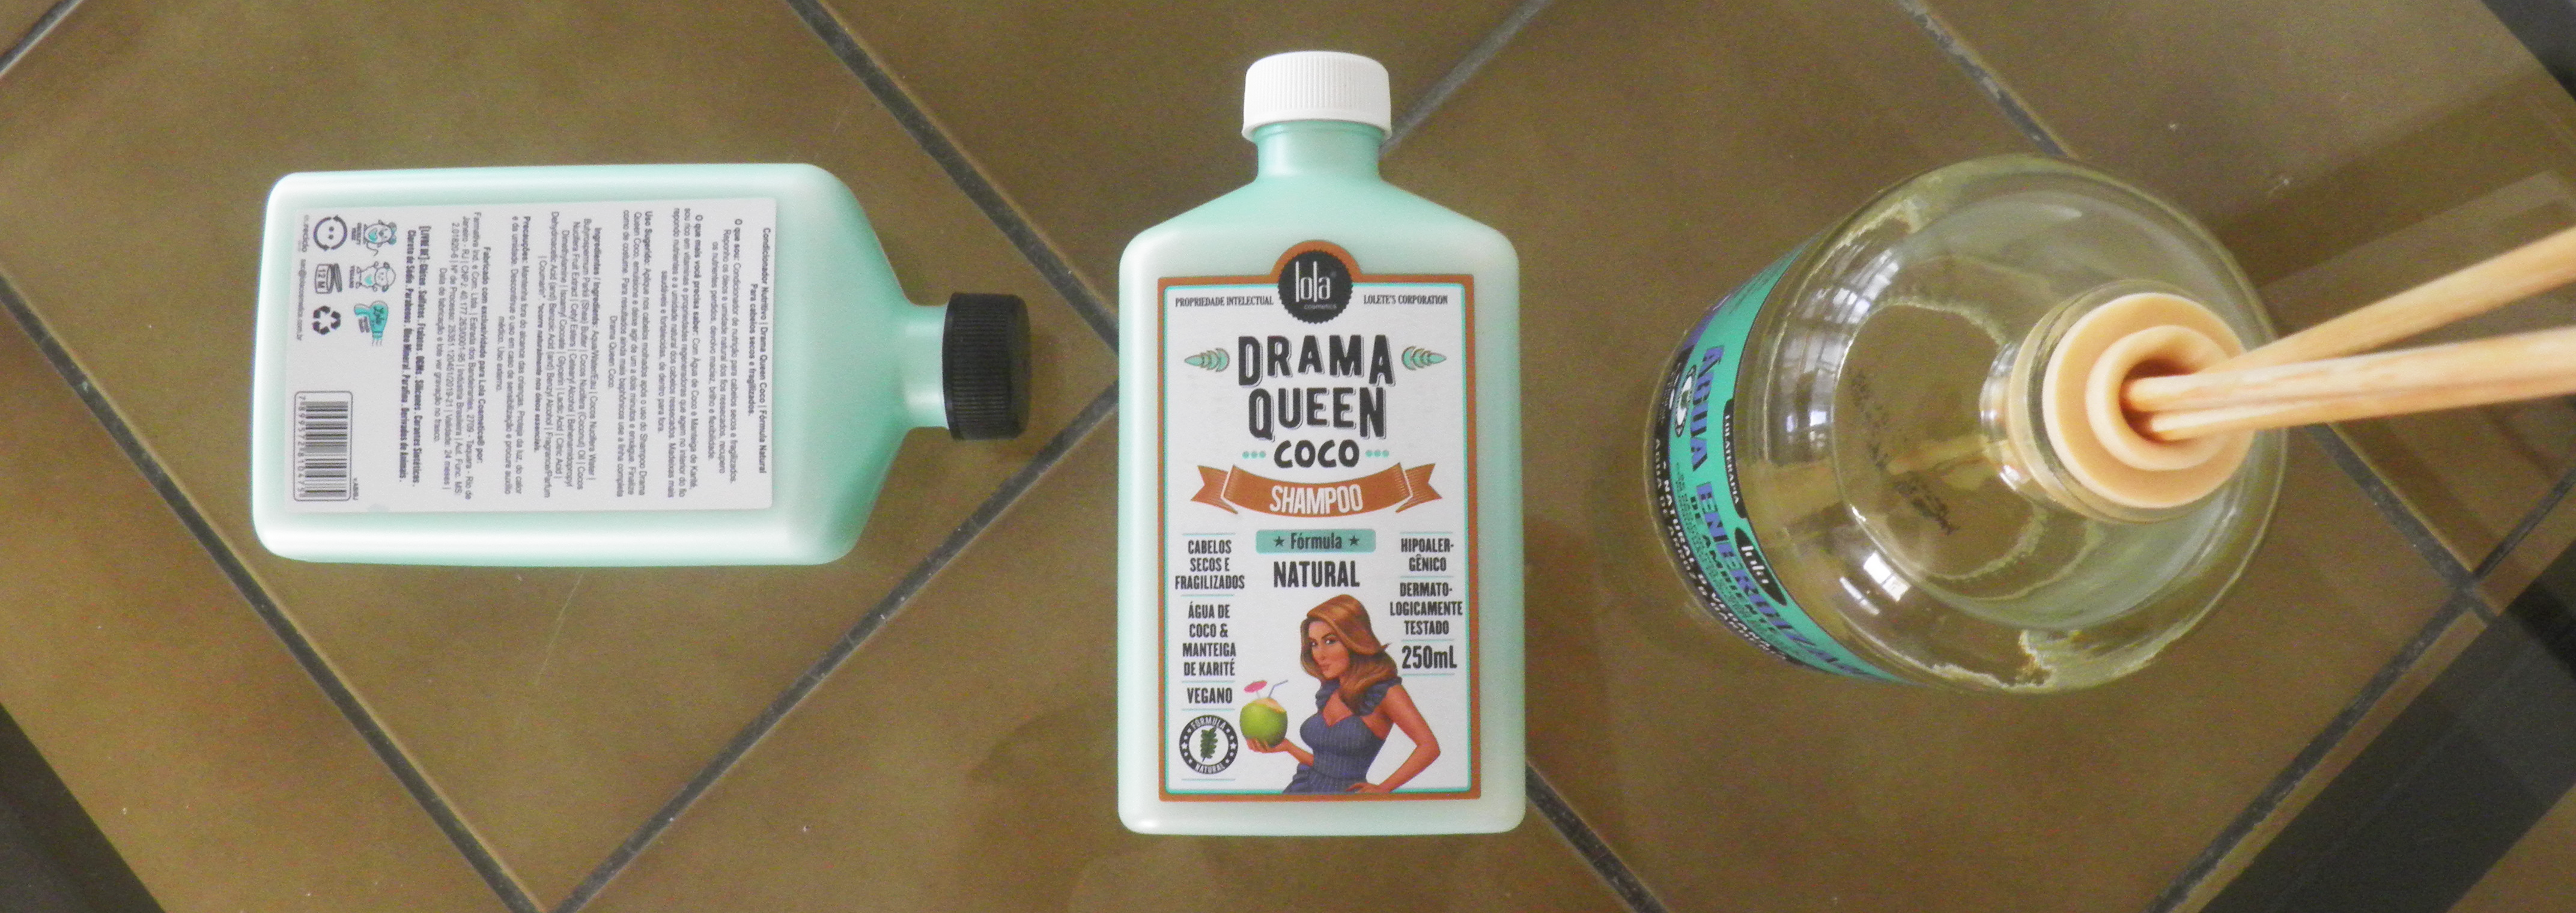 Resenha Shampoo Drama Queen Coco - Lola Cosmétics